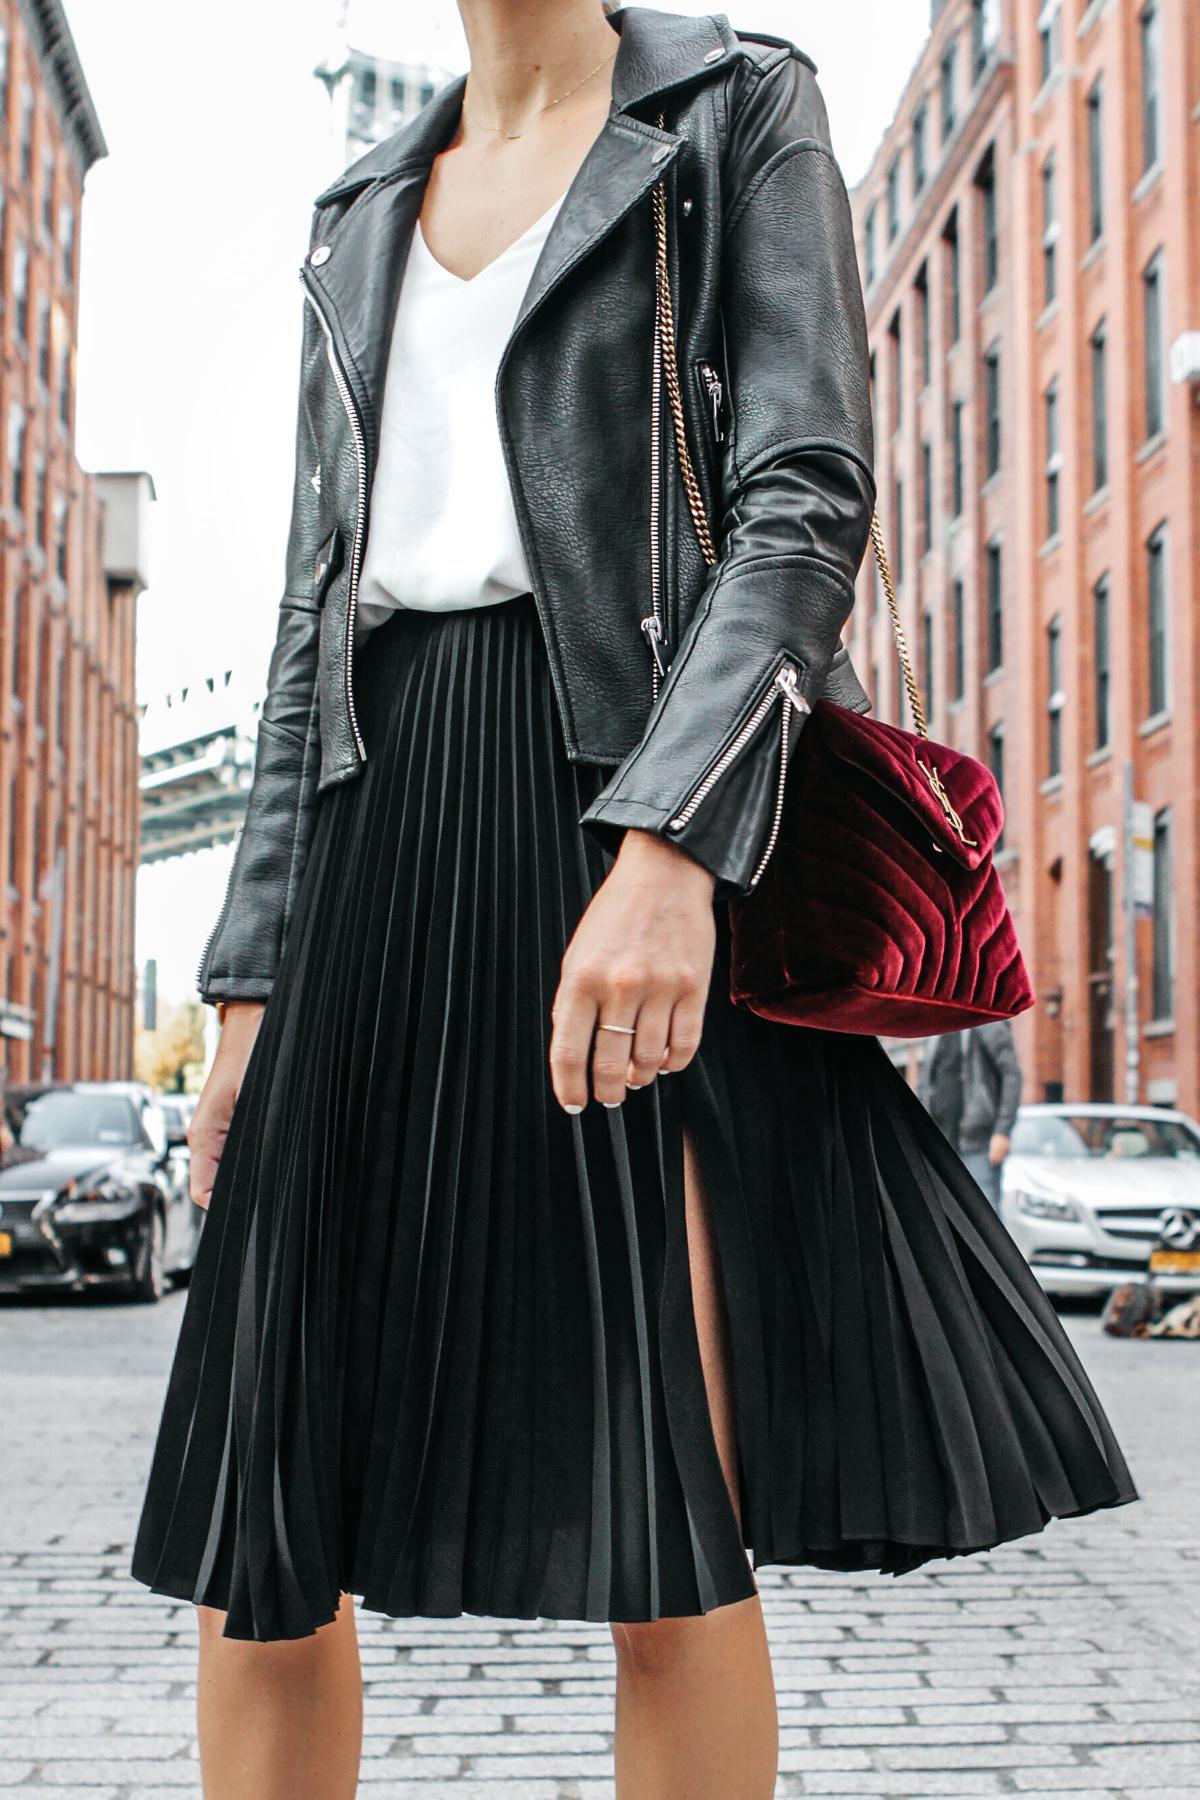 Black Leather Jacket Black Pleated Midi Skirt Saint Laurent Burgundy Velvet Bag Fashion Jackson Dallas Blogger Fashion Blogger Street Style NYFW Dumbo Bridge